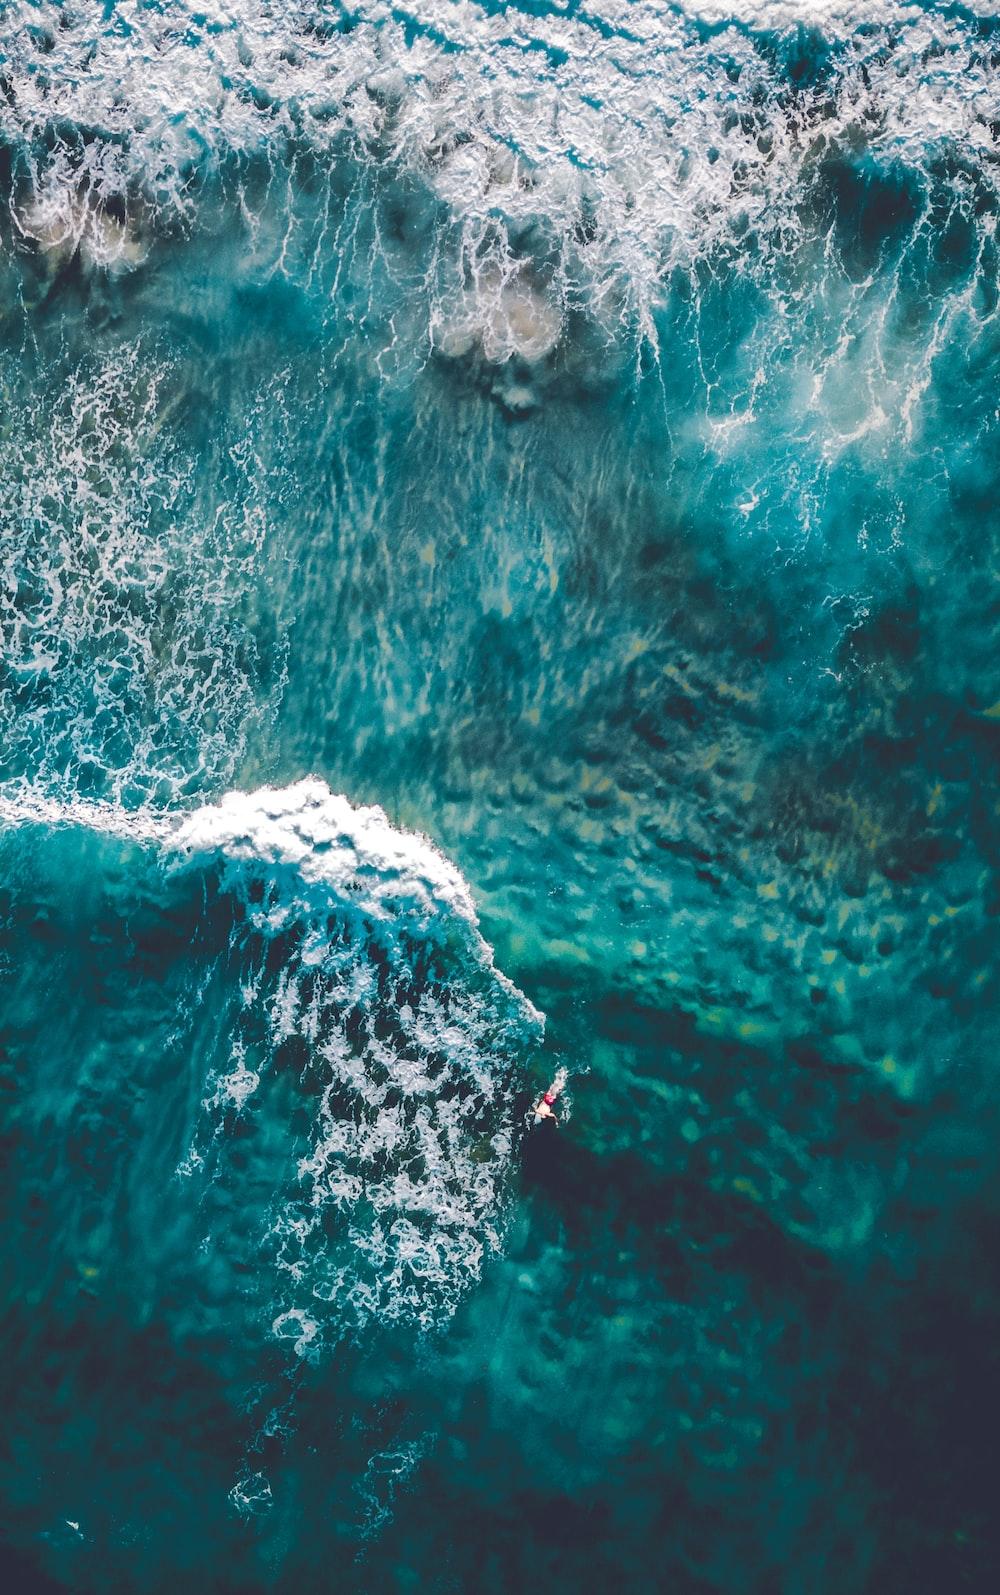 wavy ocean in aerial photography